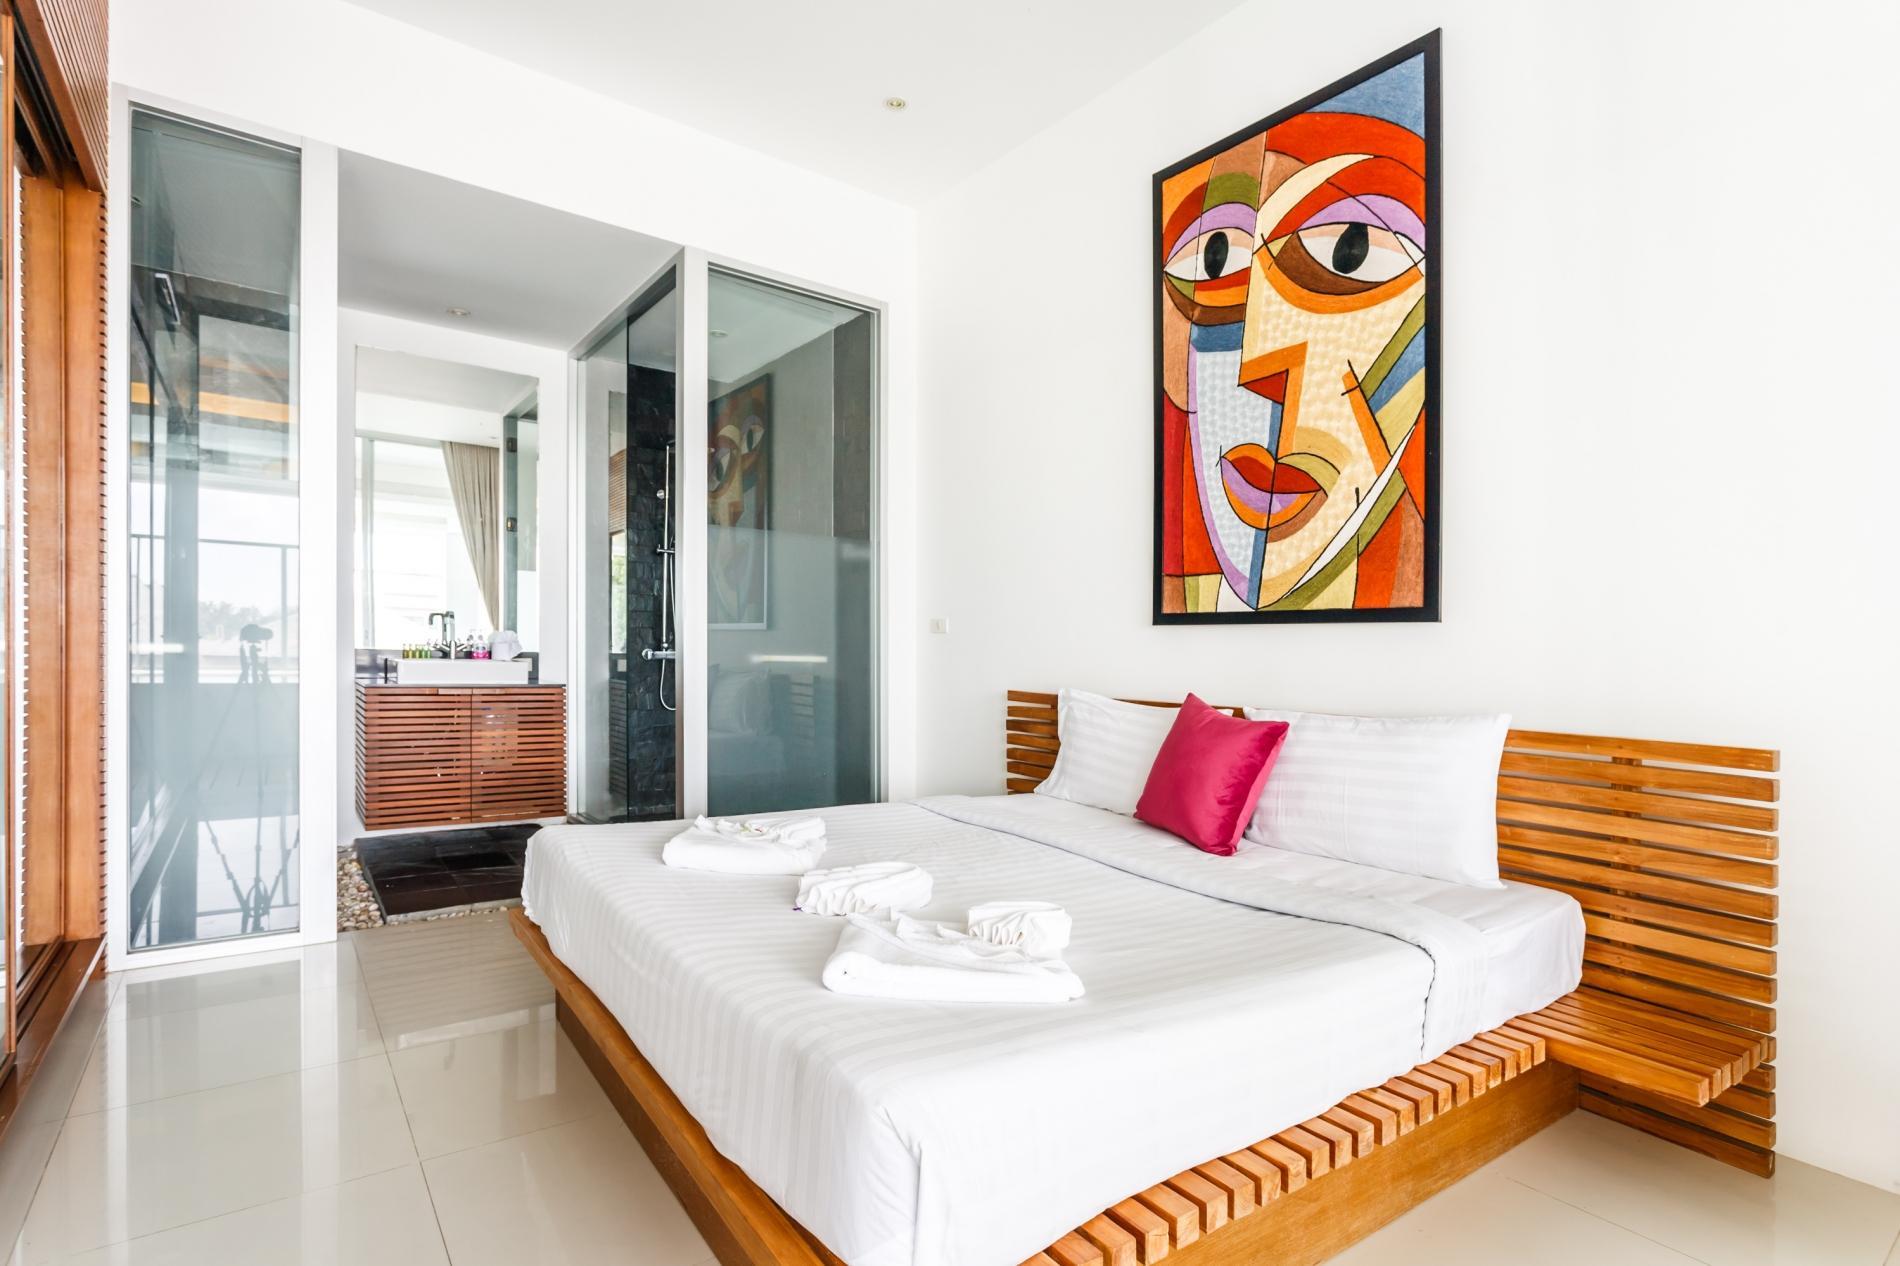 Apartment The Quarter 301 - Luxury Surin 3 bedroom apartment private pool photo 20339844